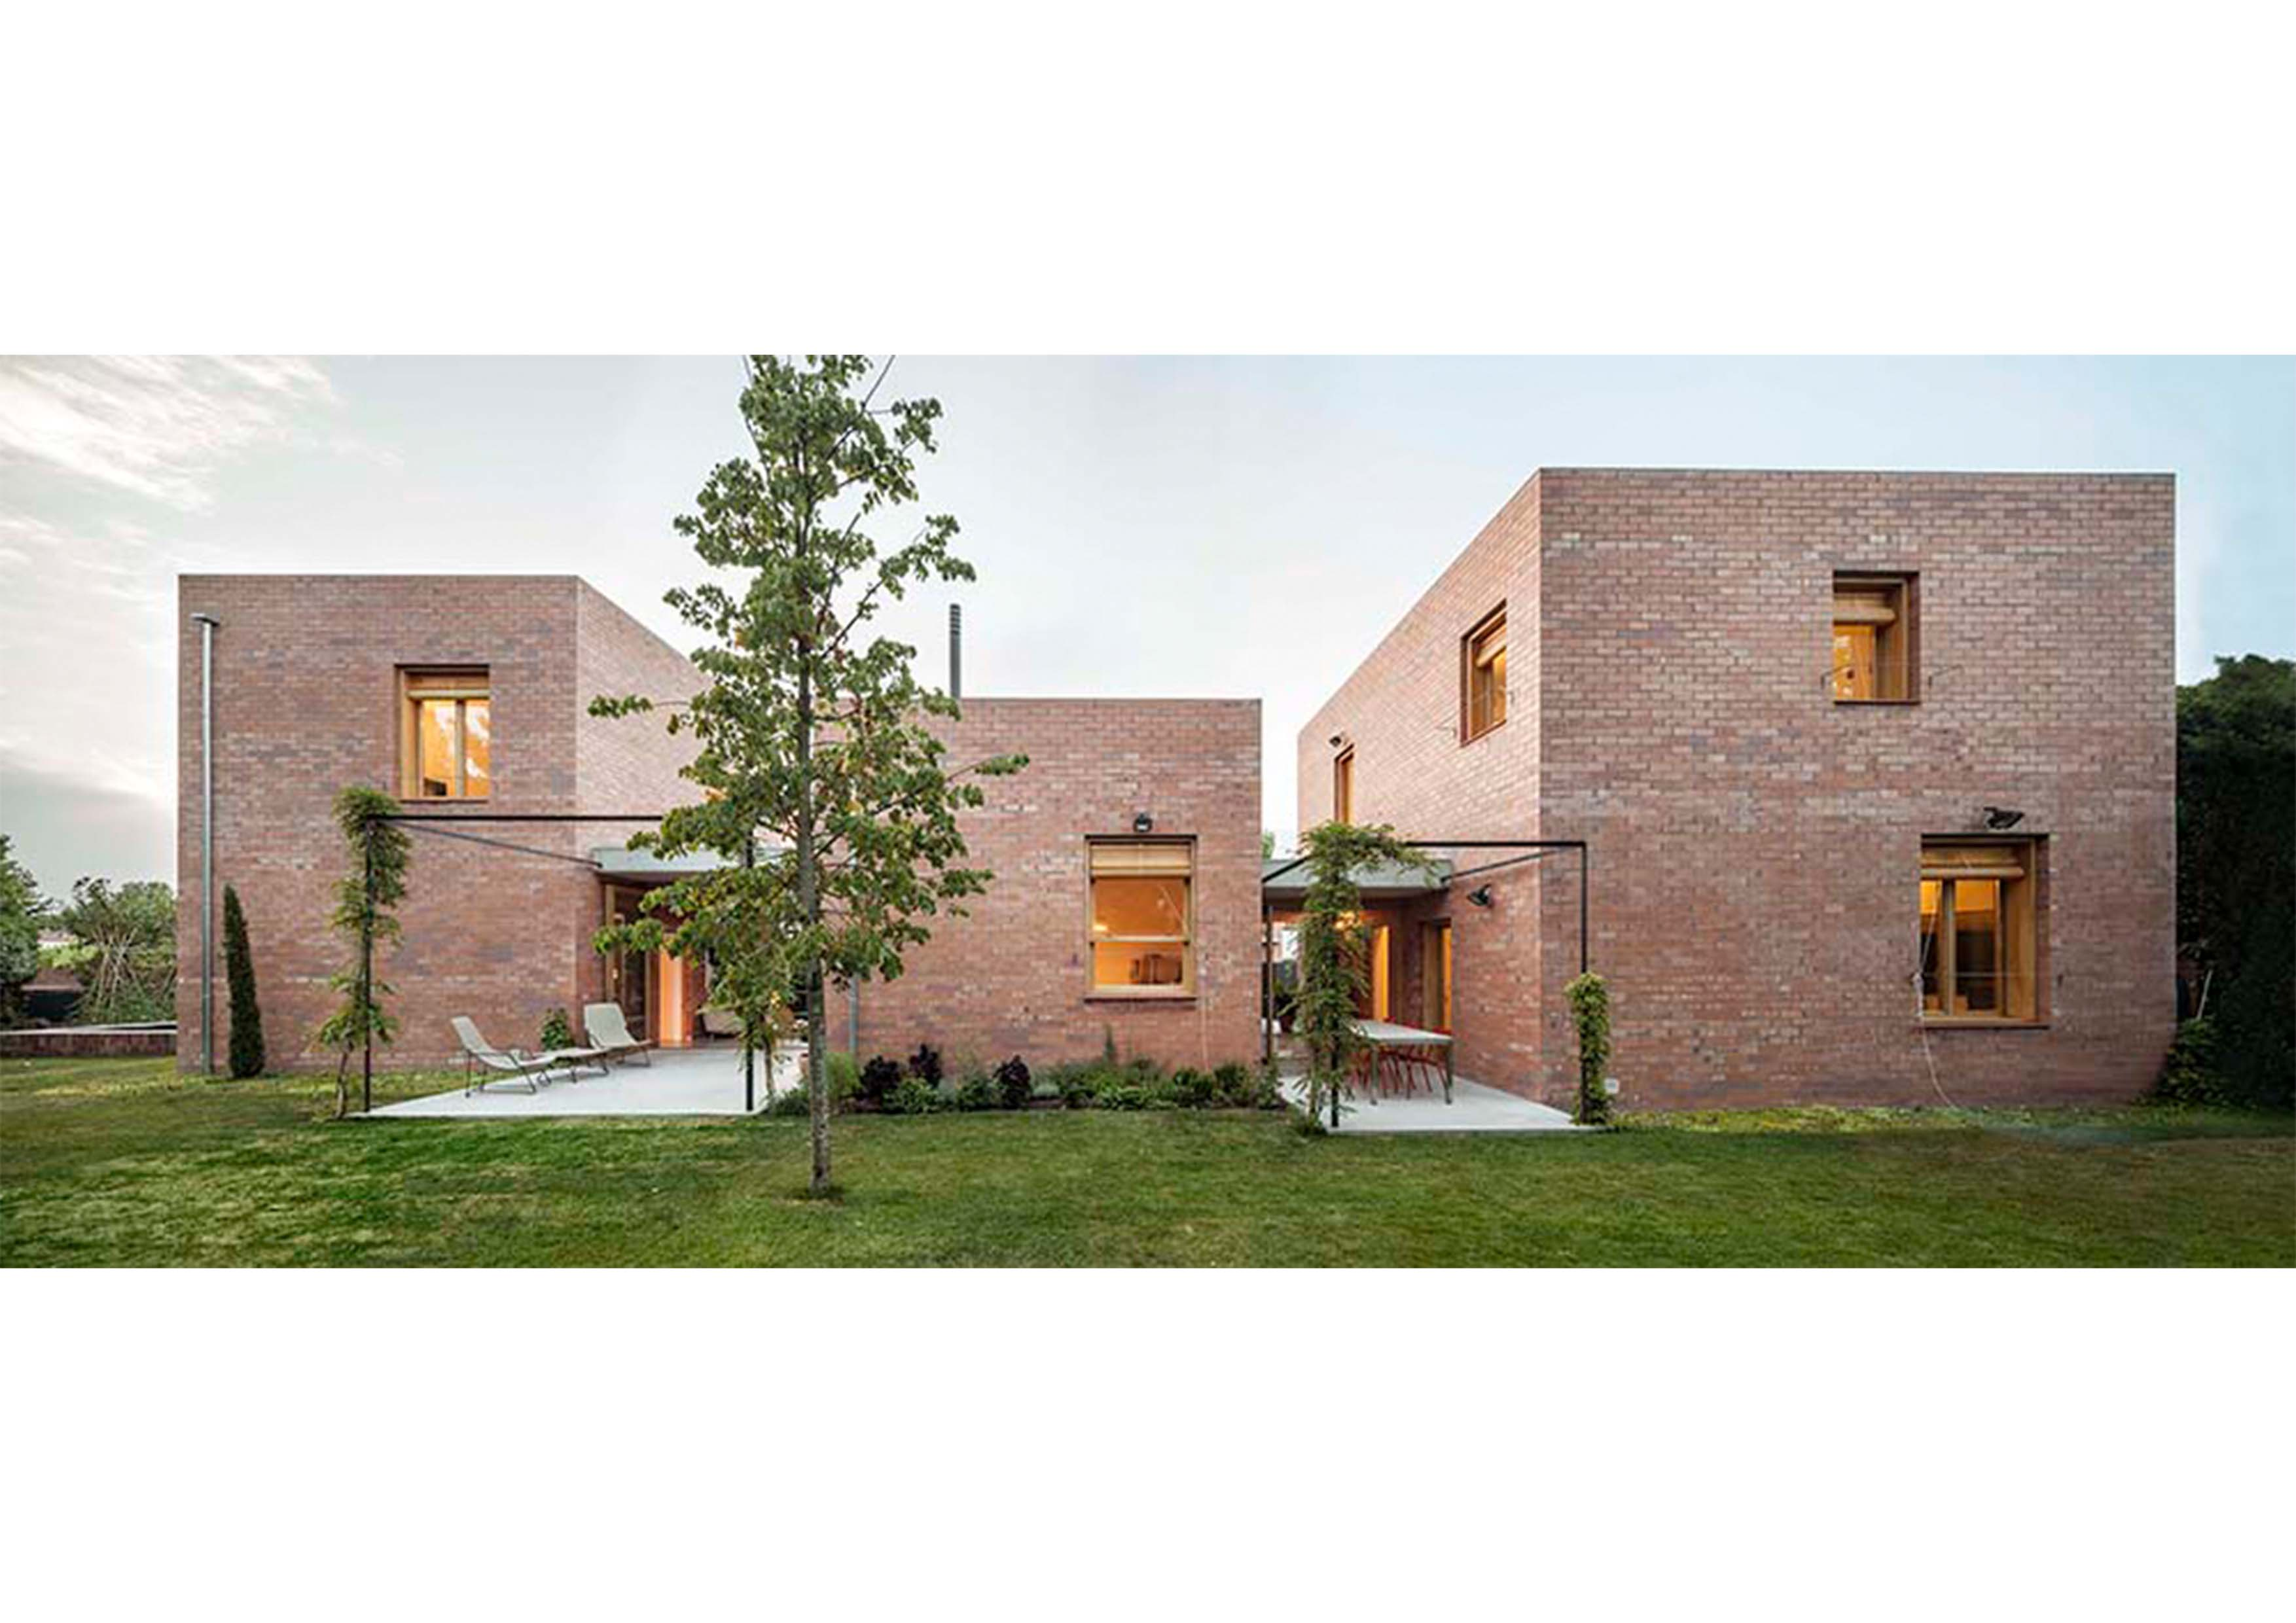 Arquitectura contempor nea espa ola tc cuadernos for Arquitectura contemporanea casas